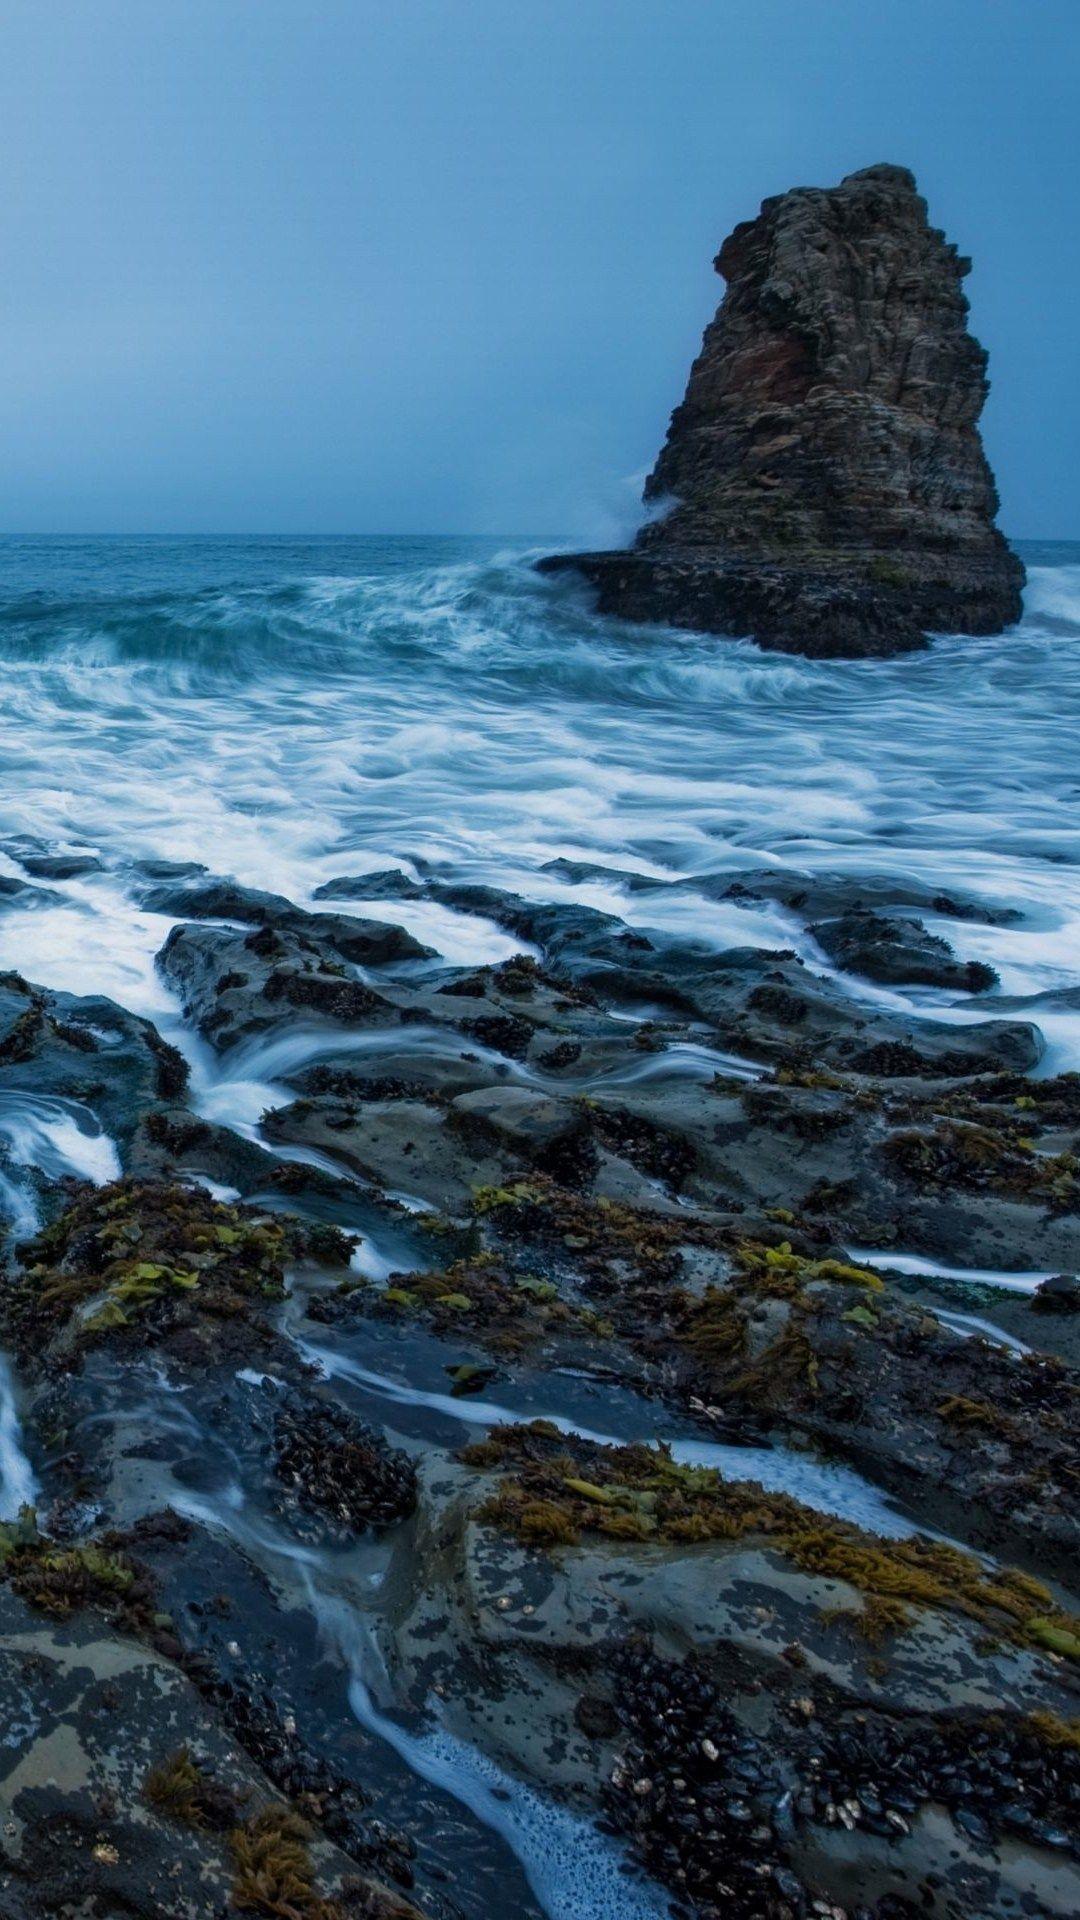 Surging Wave Among Rock Mountain iPhone 6 plus